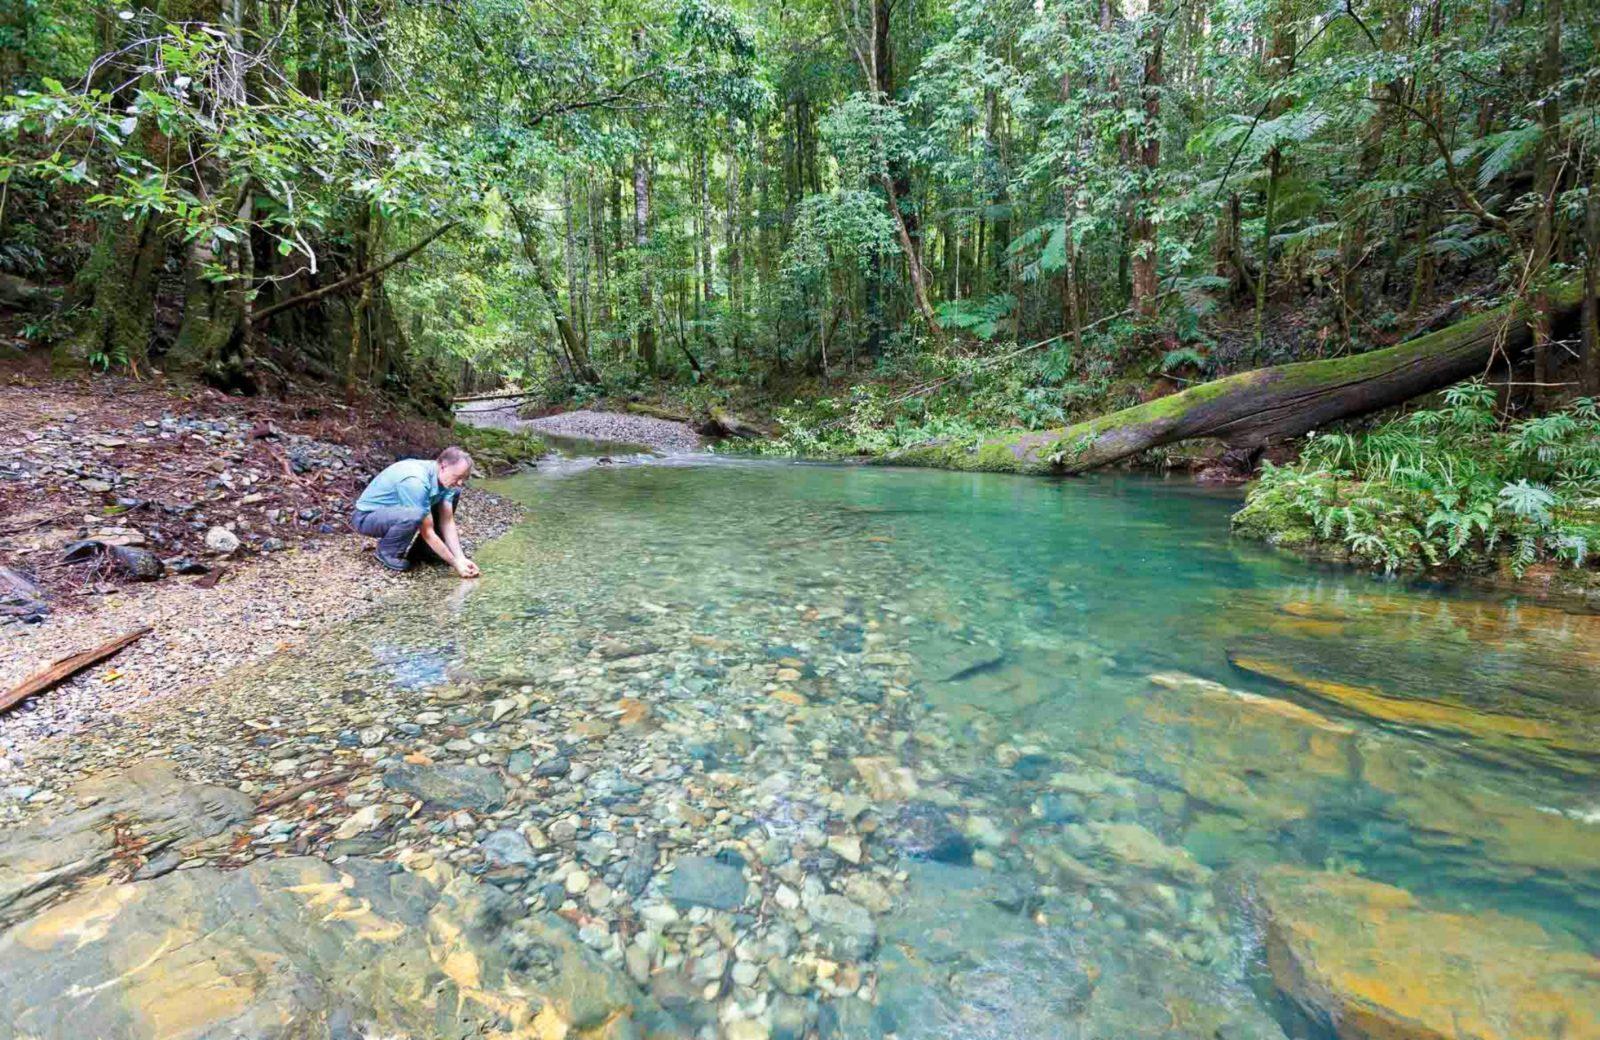 Rosewood Creek walking track, Dorrigo National Park. Photo: Rob Cleary